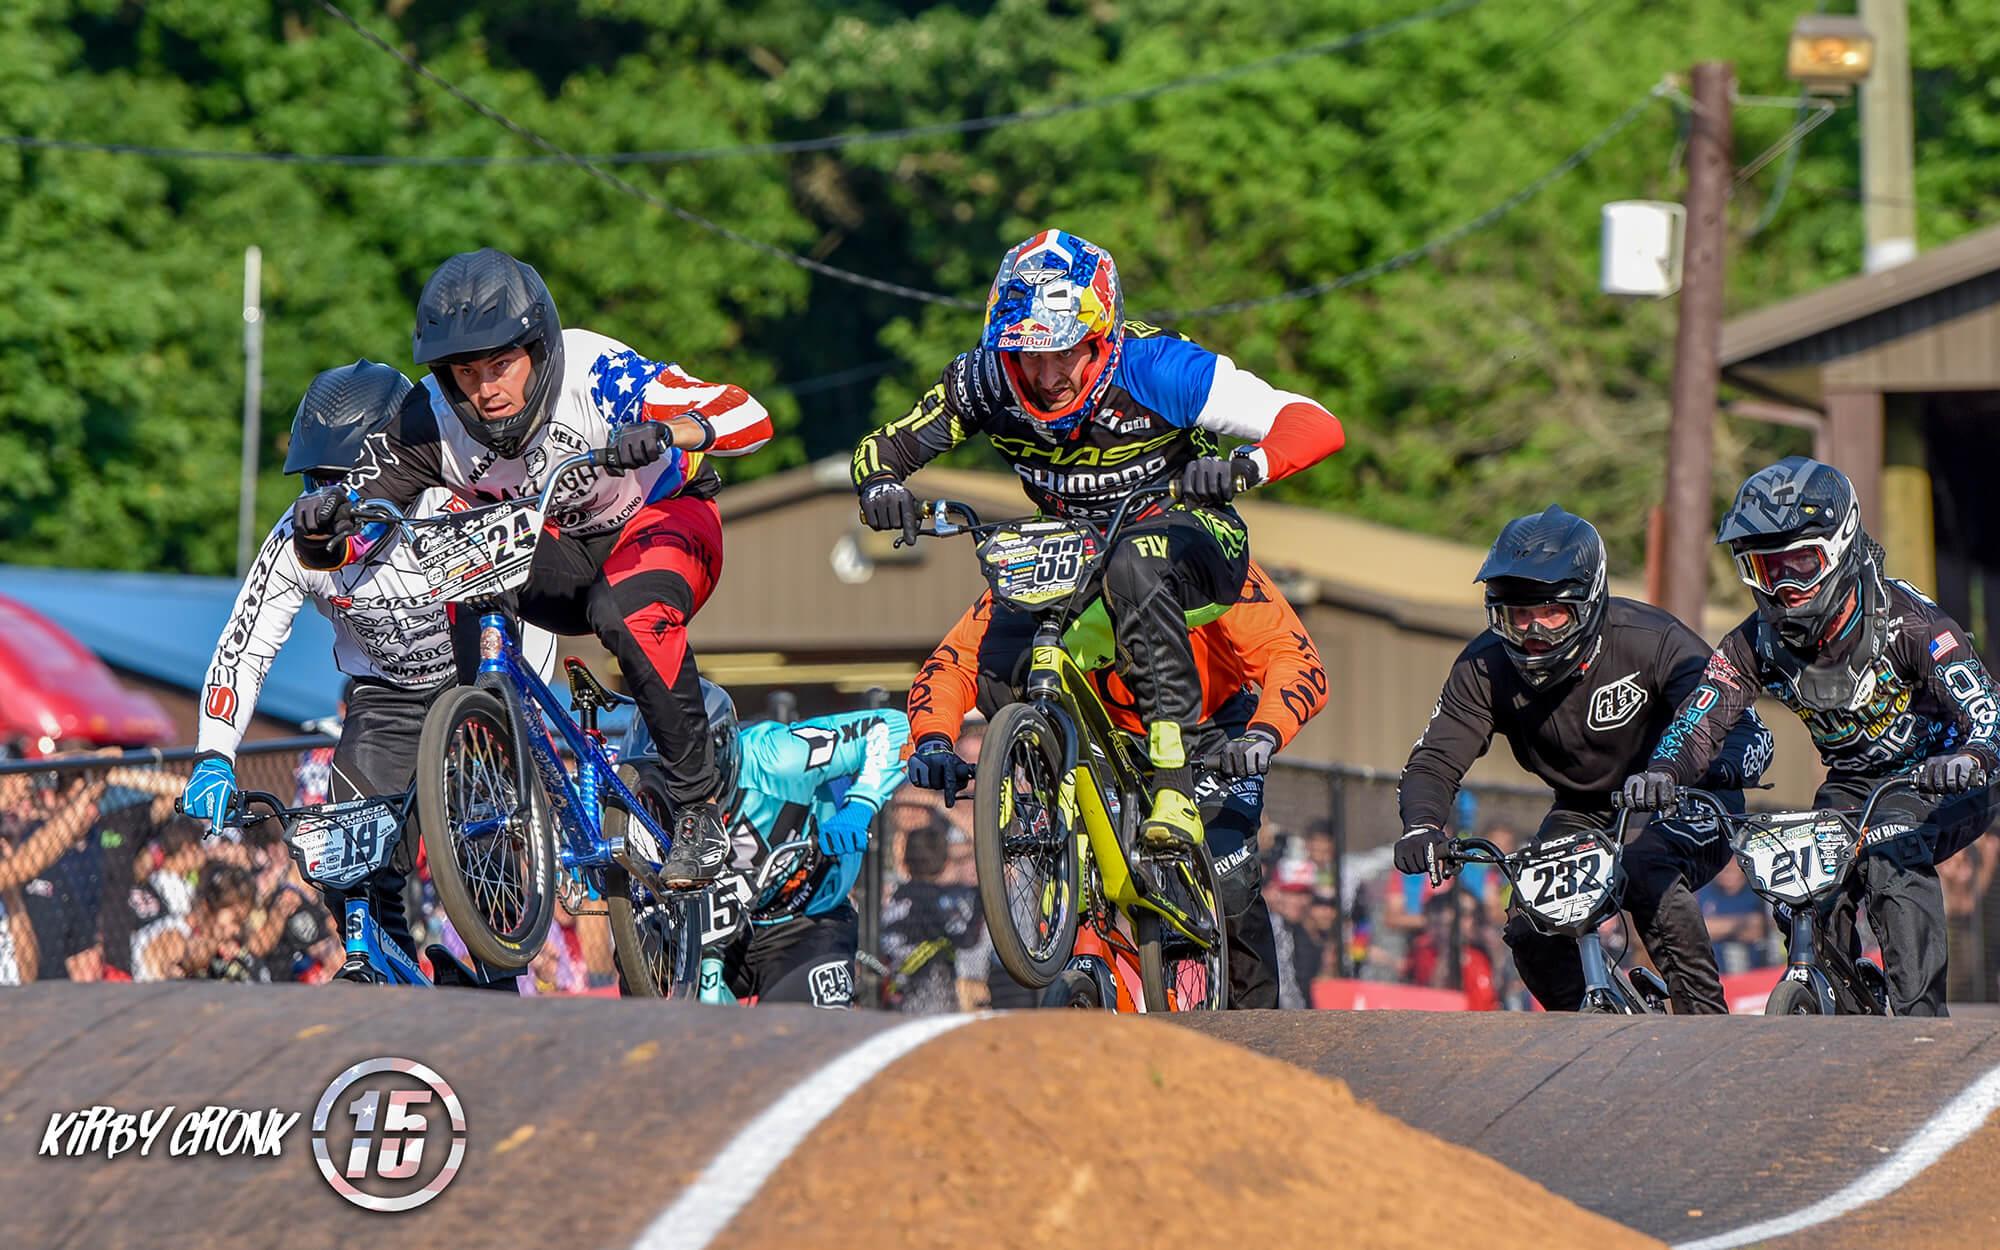 USA BMX Pro Men - Kirby Cronk